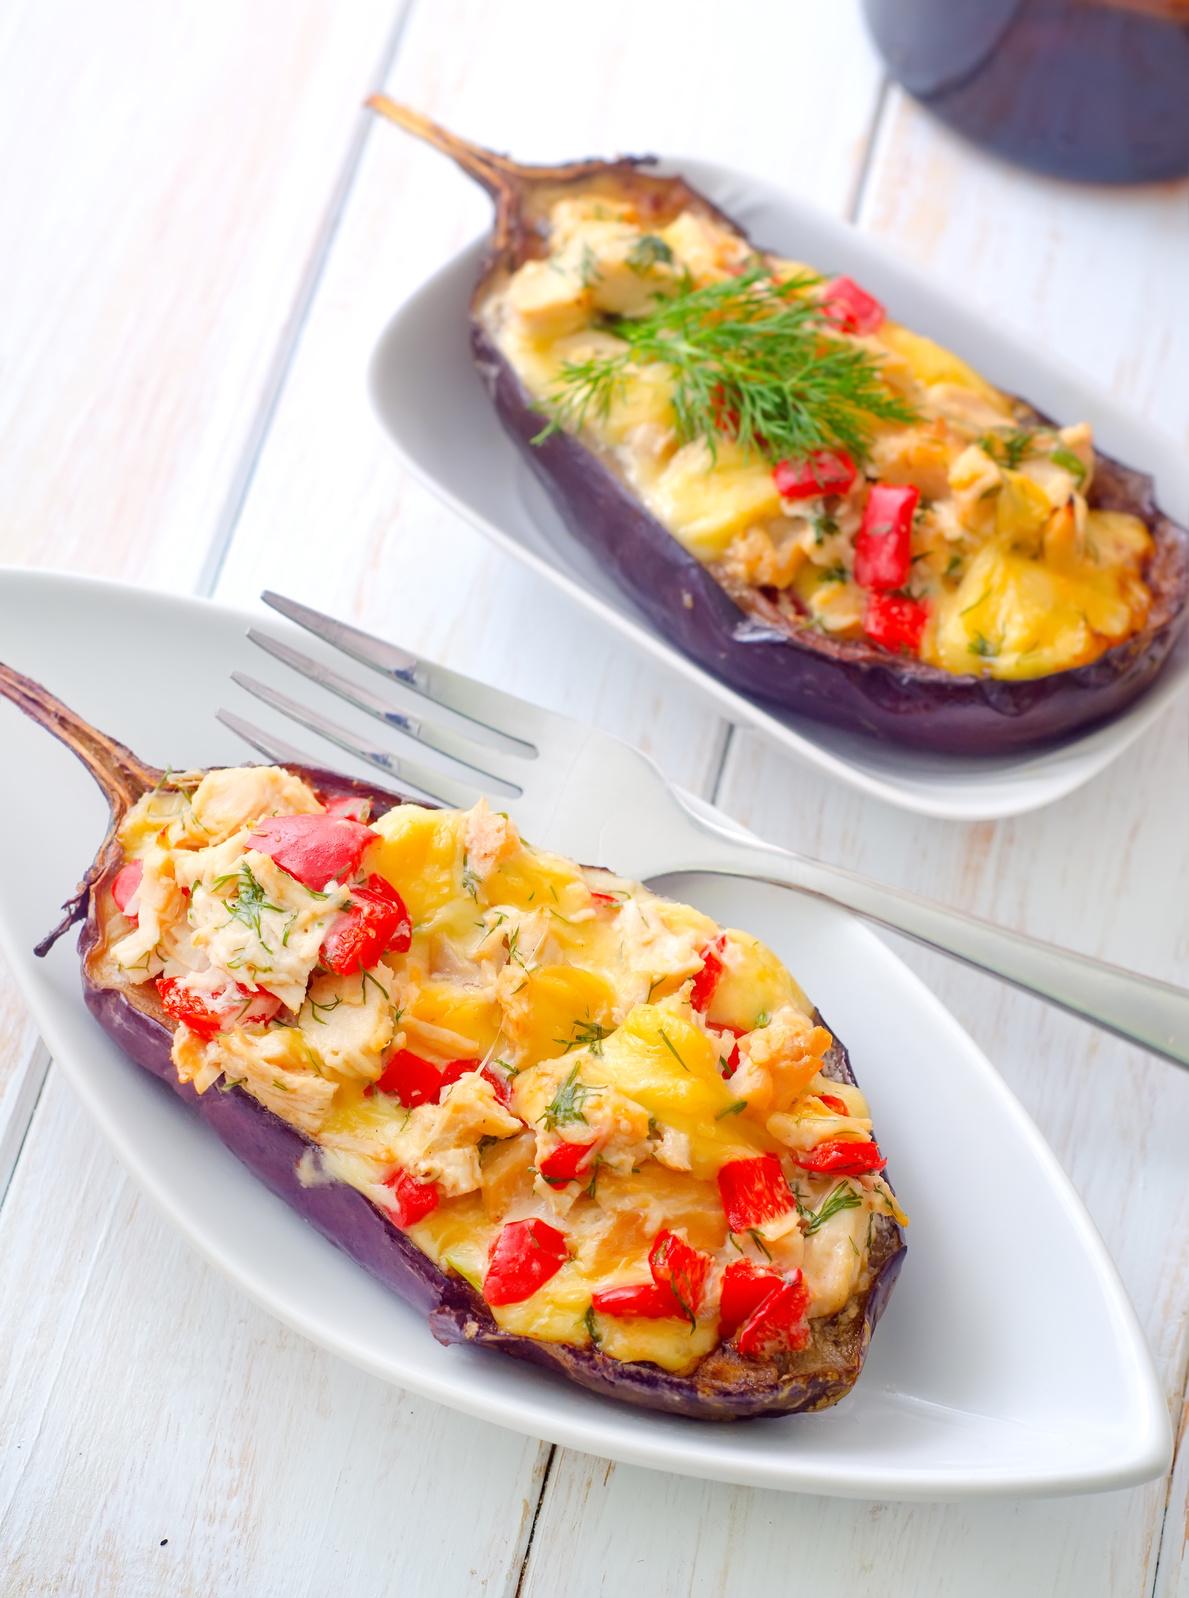 stuffed eggplants on the white plate